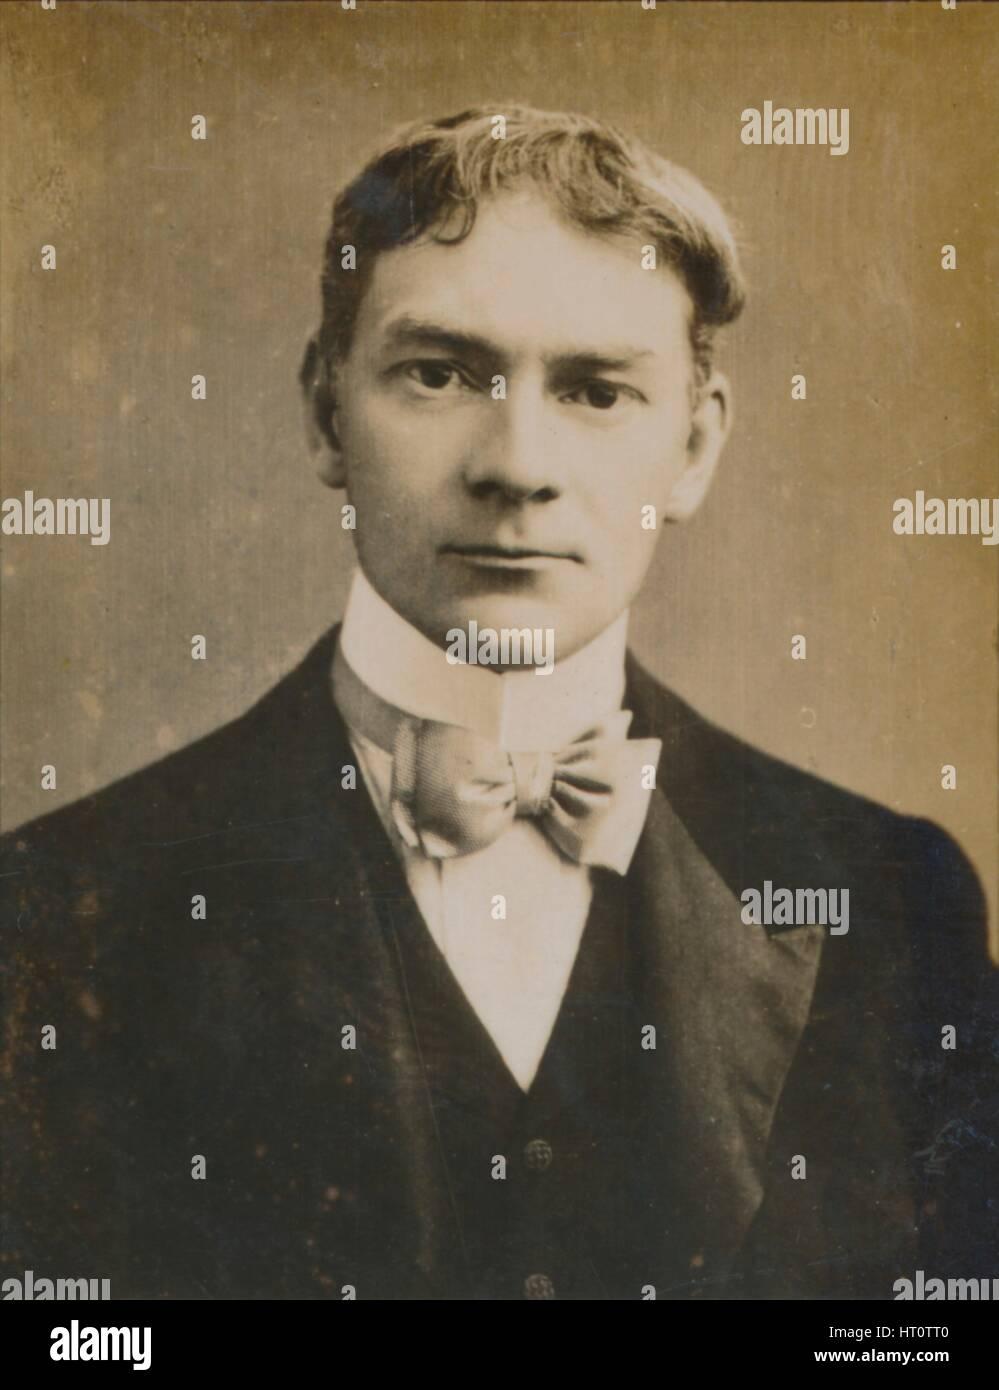 'Jerome K. Jerome', (1859-1927), English author, 1894-1907. Artist: Unknown. - Stock Image